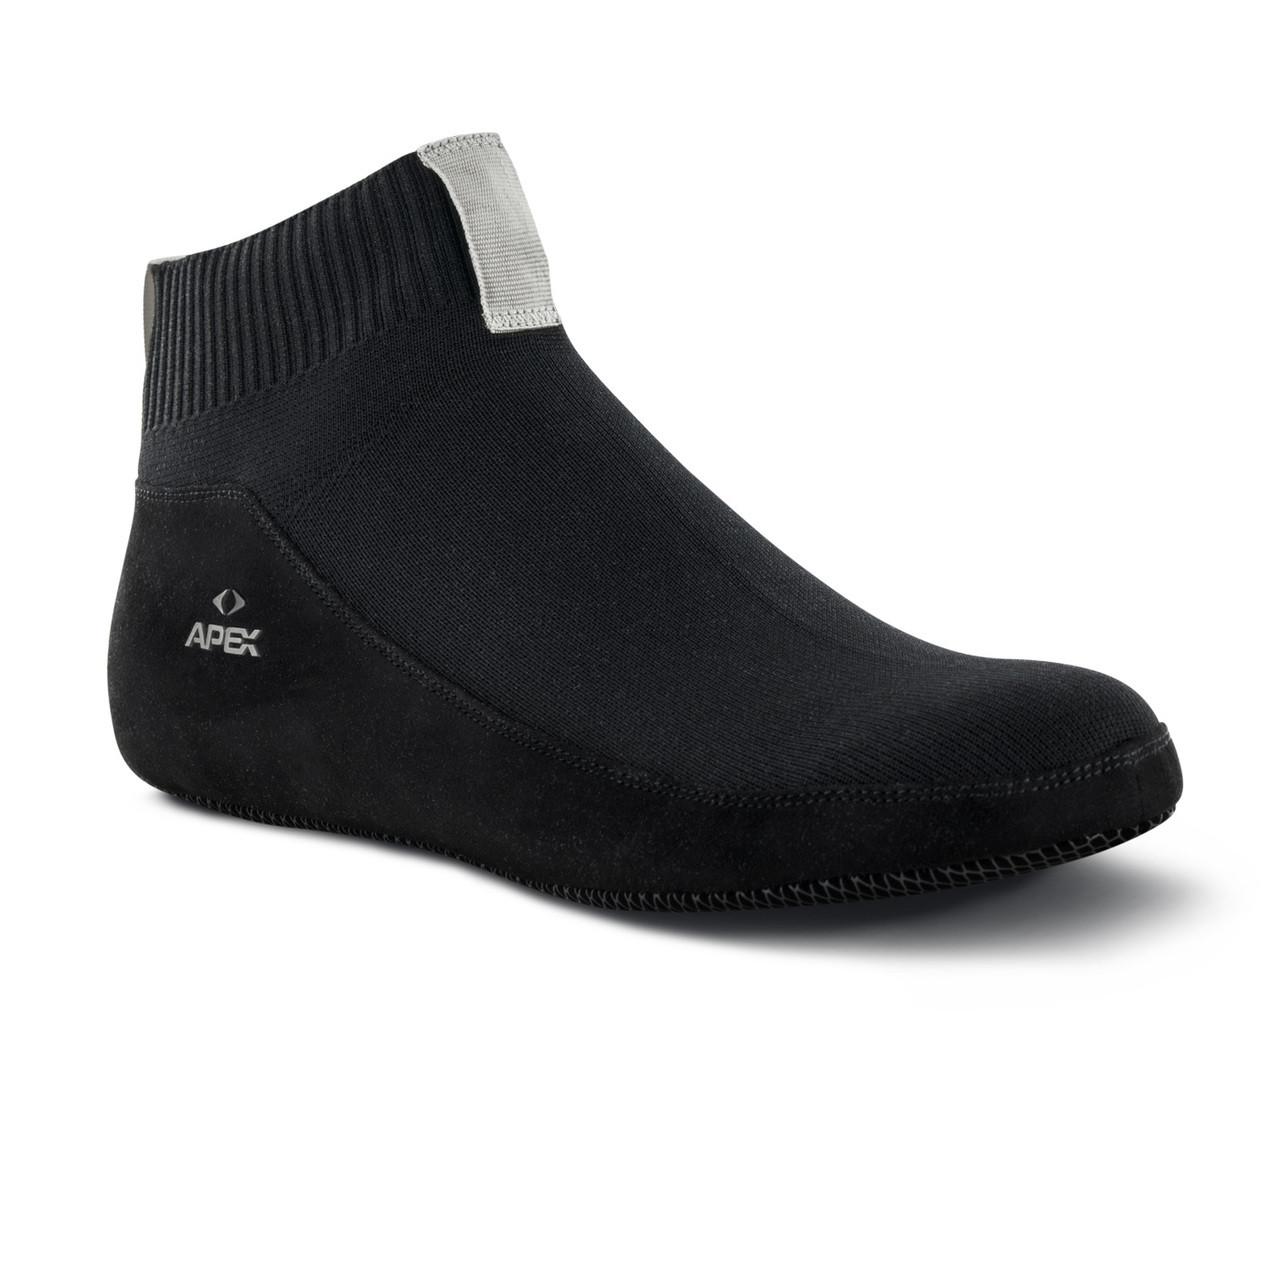 Basis Slip on shoes, Slipper Boots